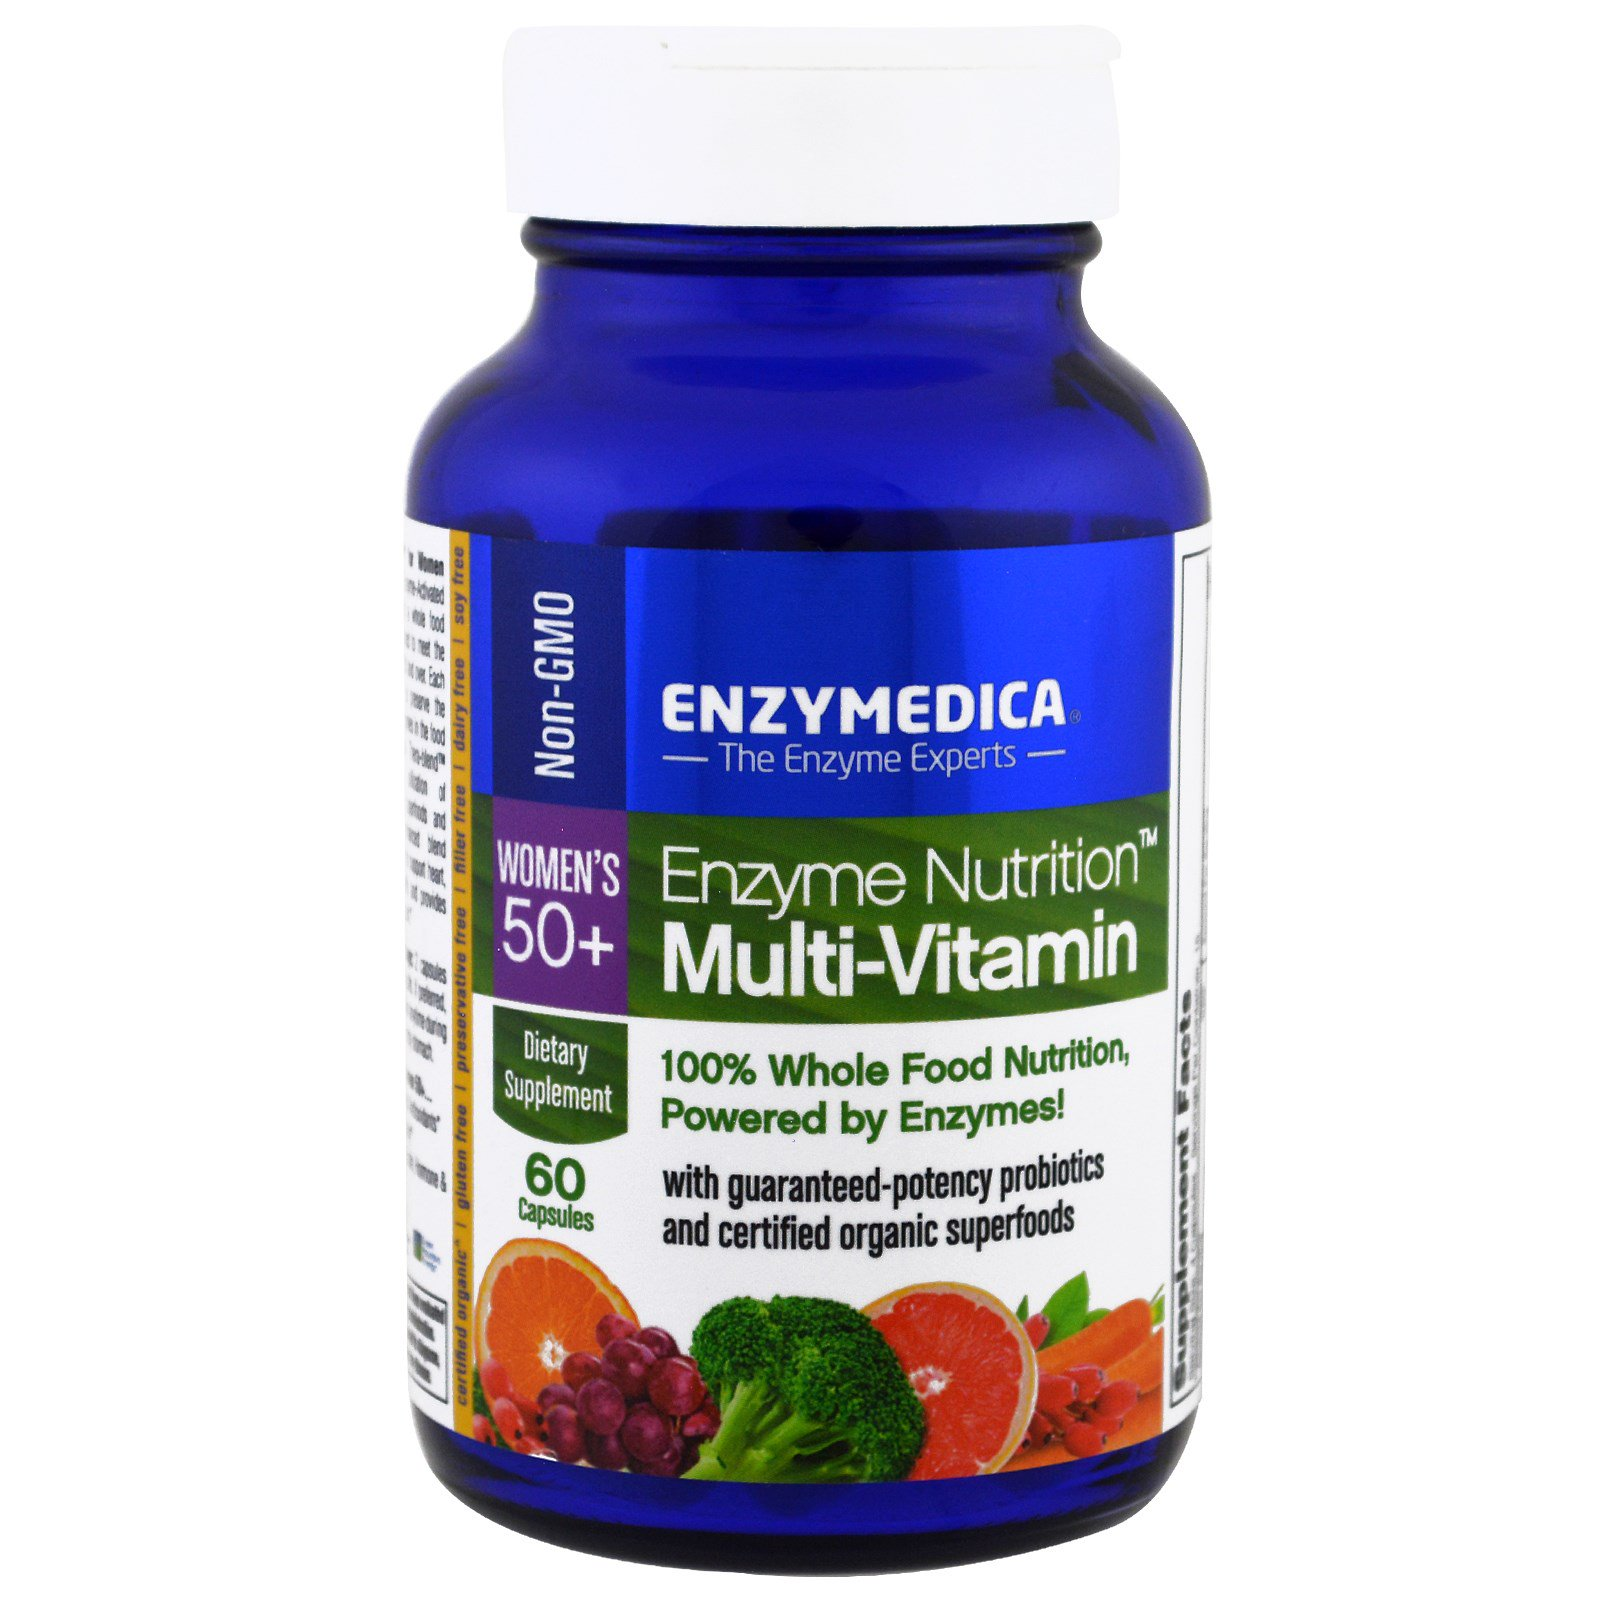 Enzymedica, Белковое питание, мультивитамины для женщин 50+, 60 капсул